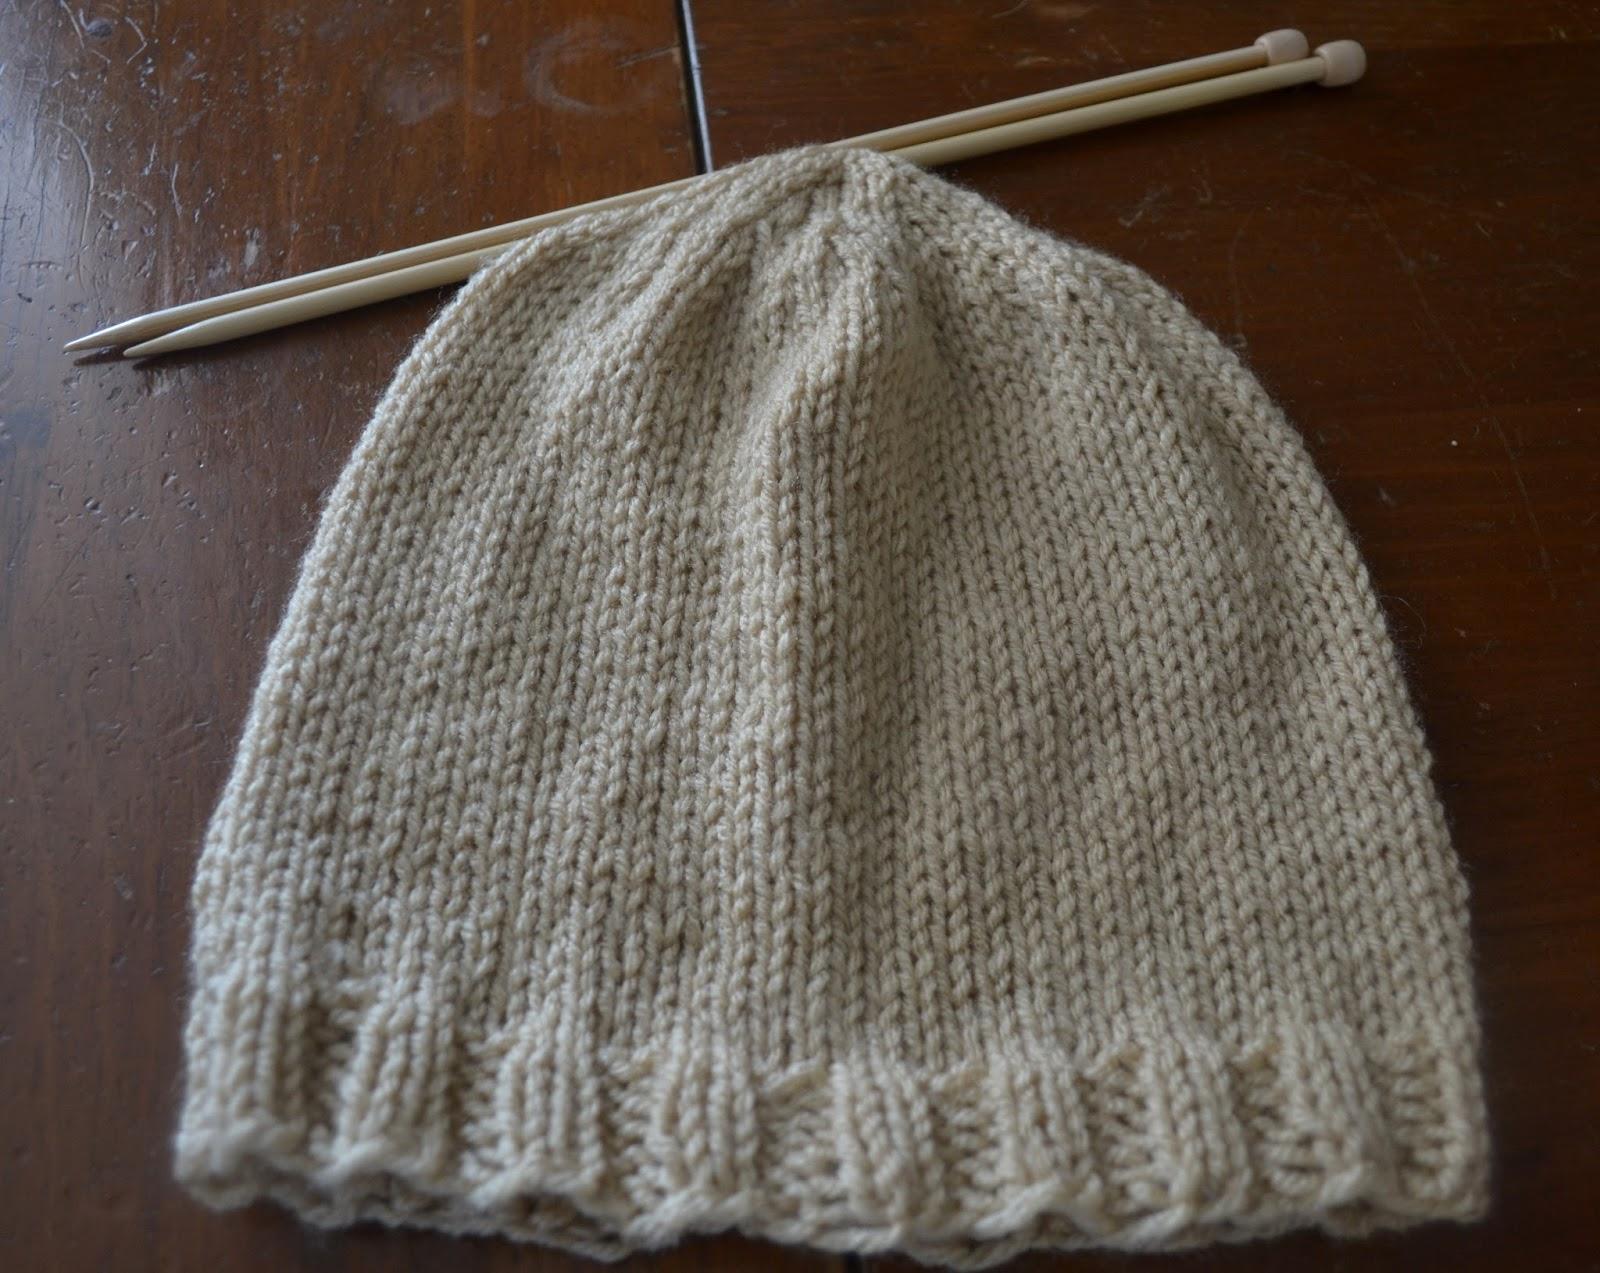 free knitting patterns for beginners free knitting pattern-basic menu0027s beanie hvccxox